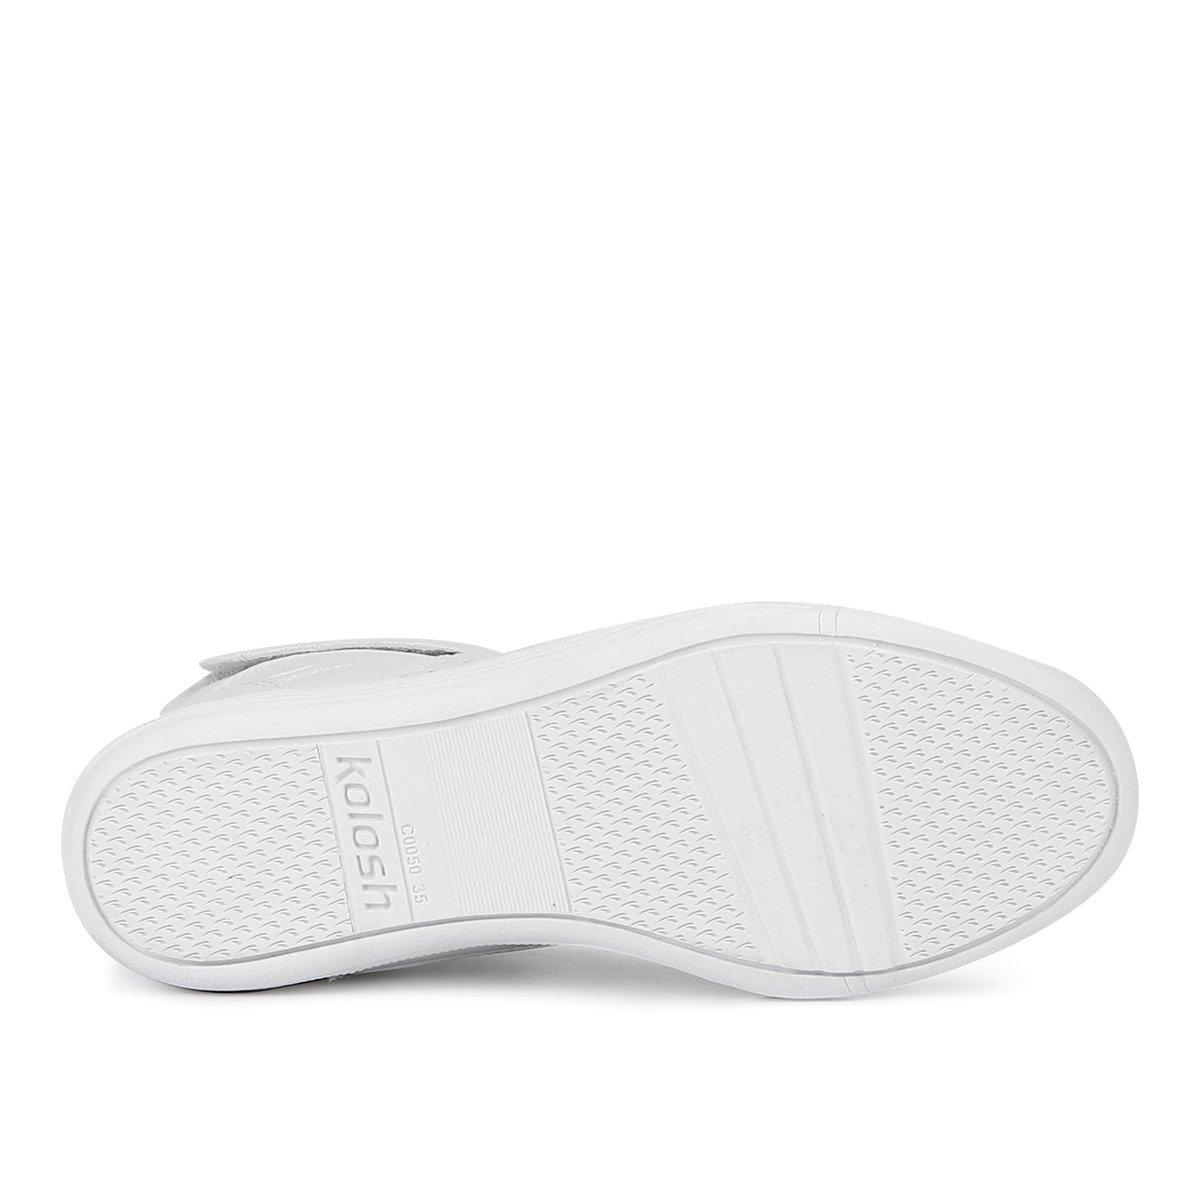 Tênis Branco Feminino Kolosh Cano Cano Alto Tênis Velcro Kolosh BpUPBrqnw